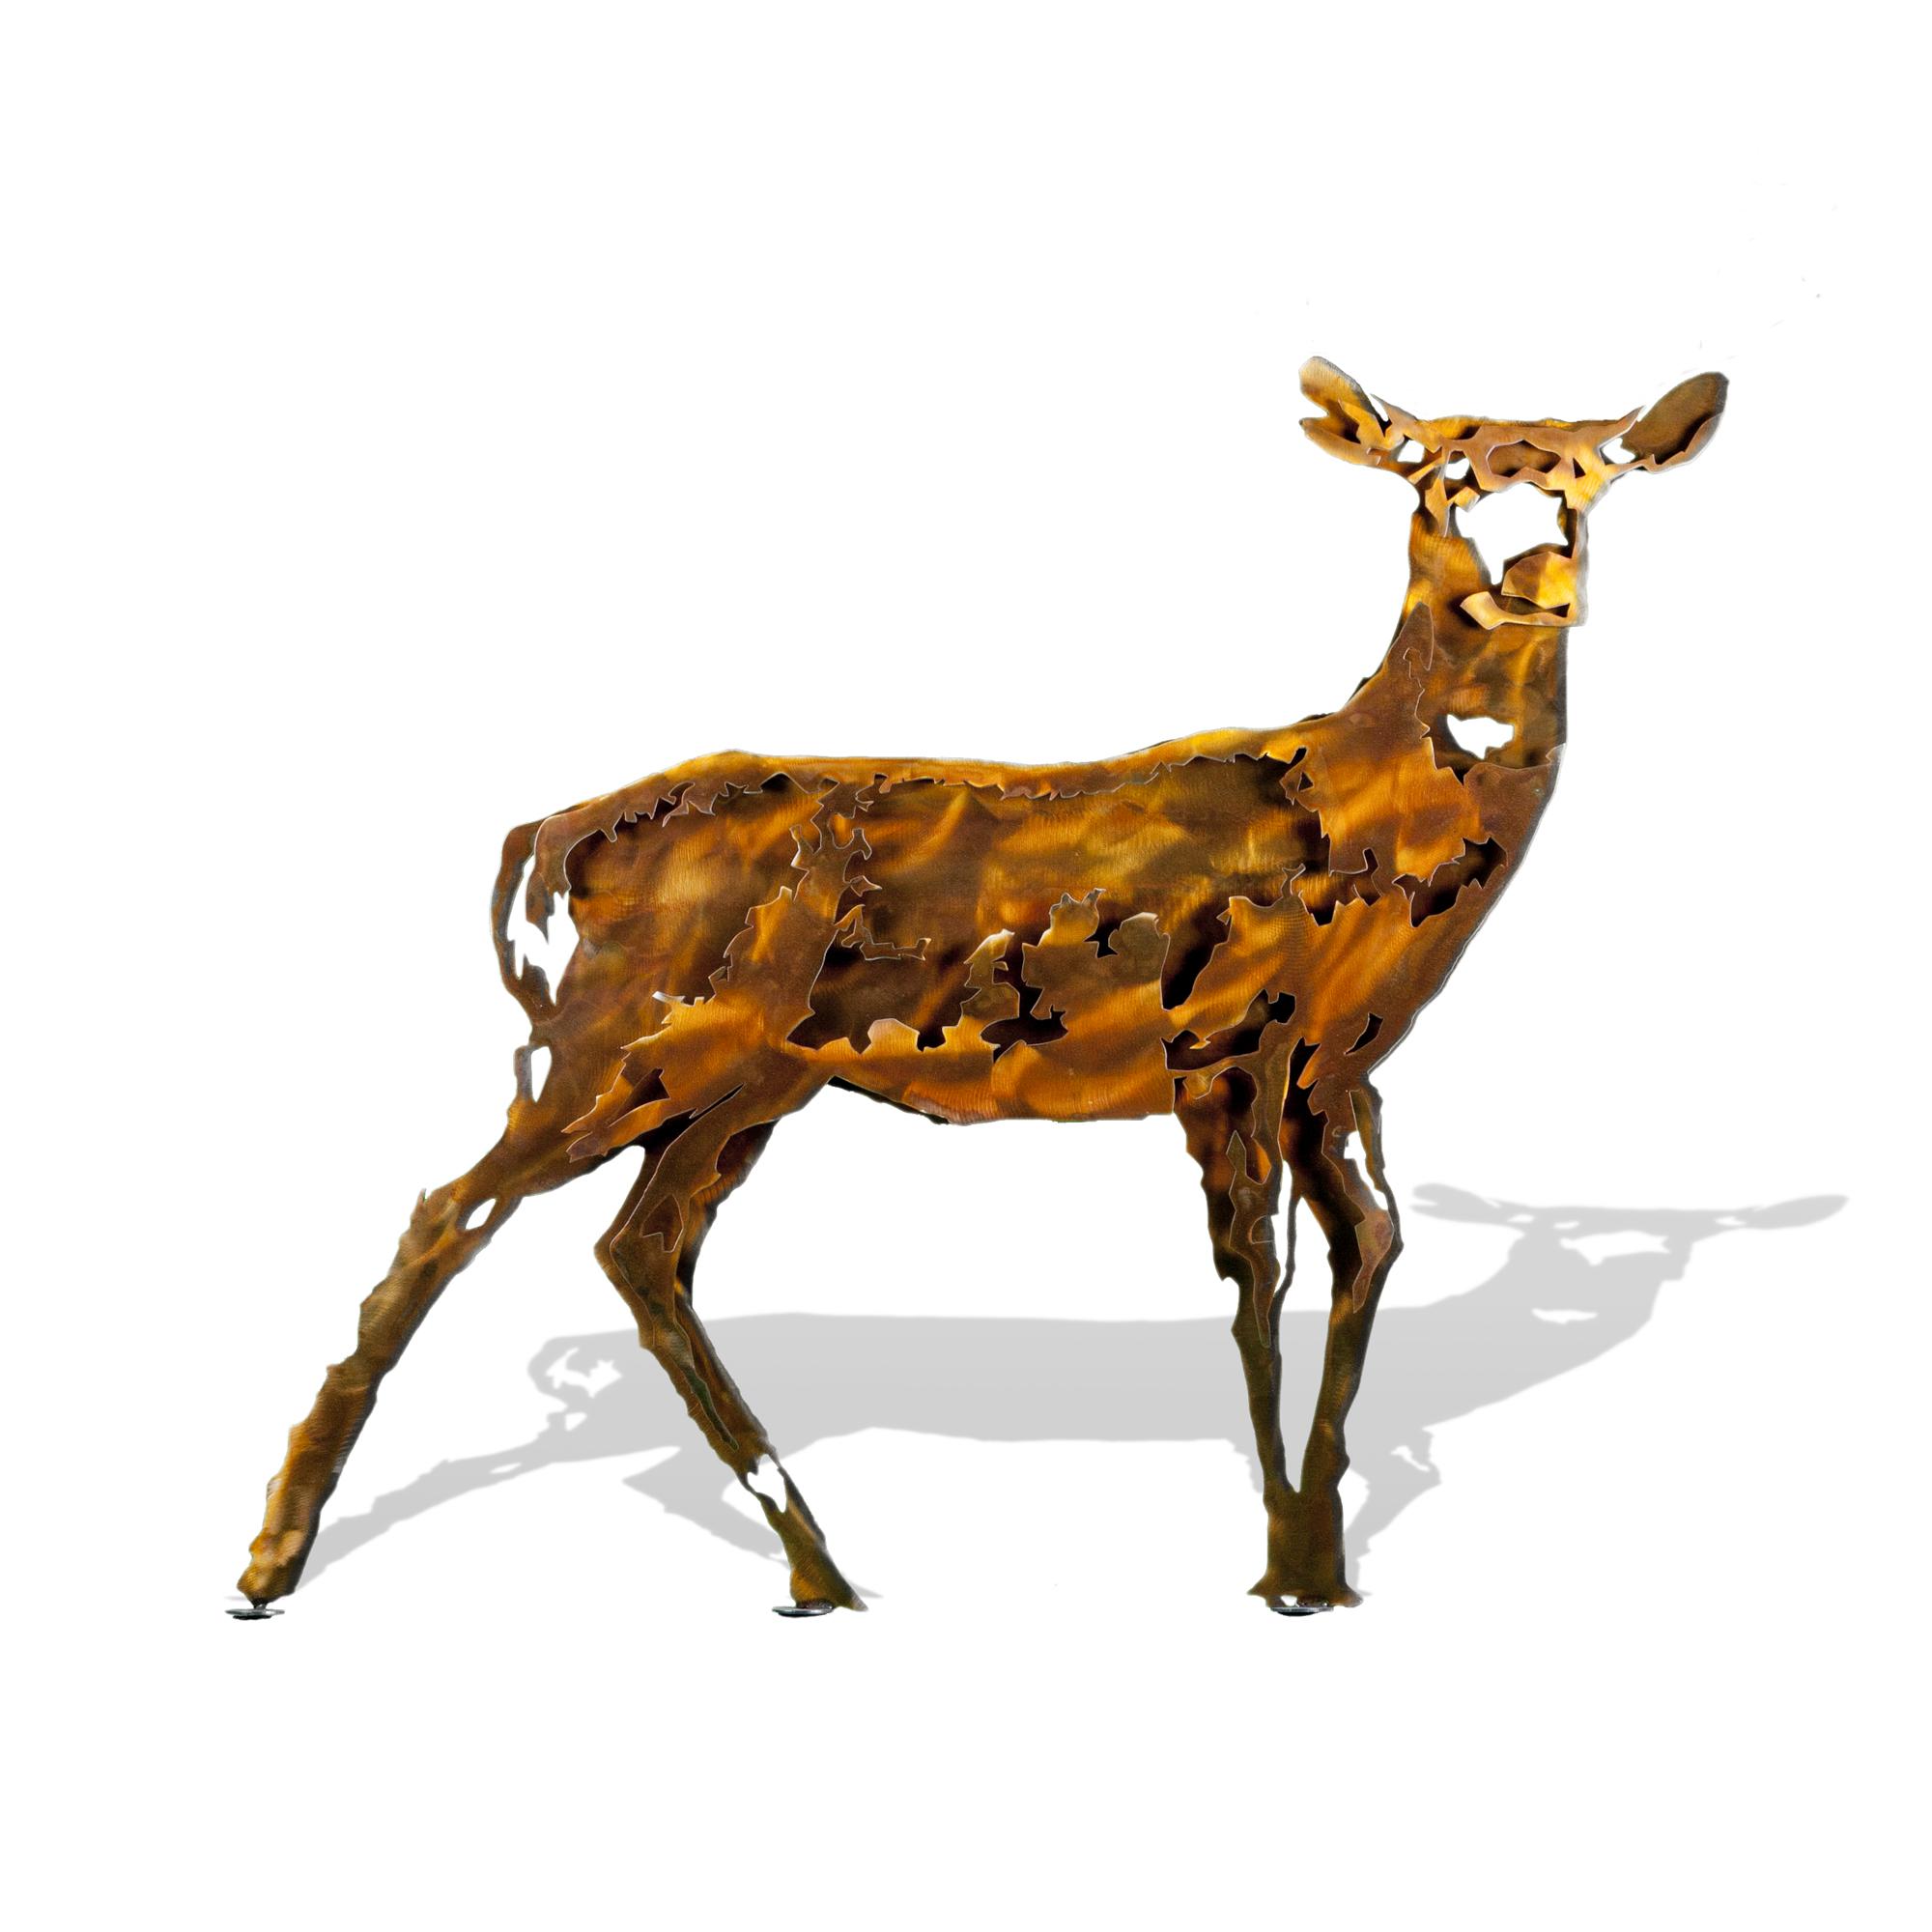 Deer Doe - Stylized Brown Patina Large Stake Metal Artwork Form